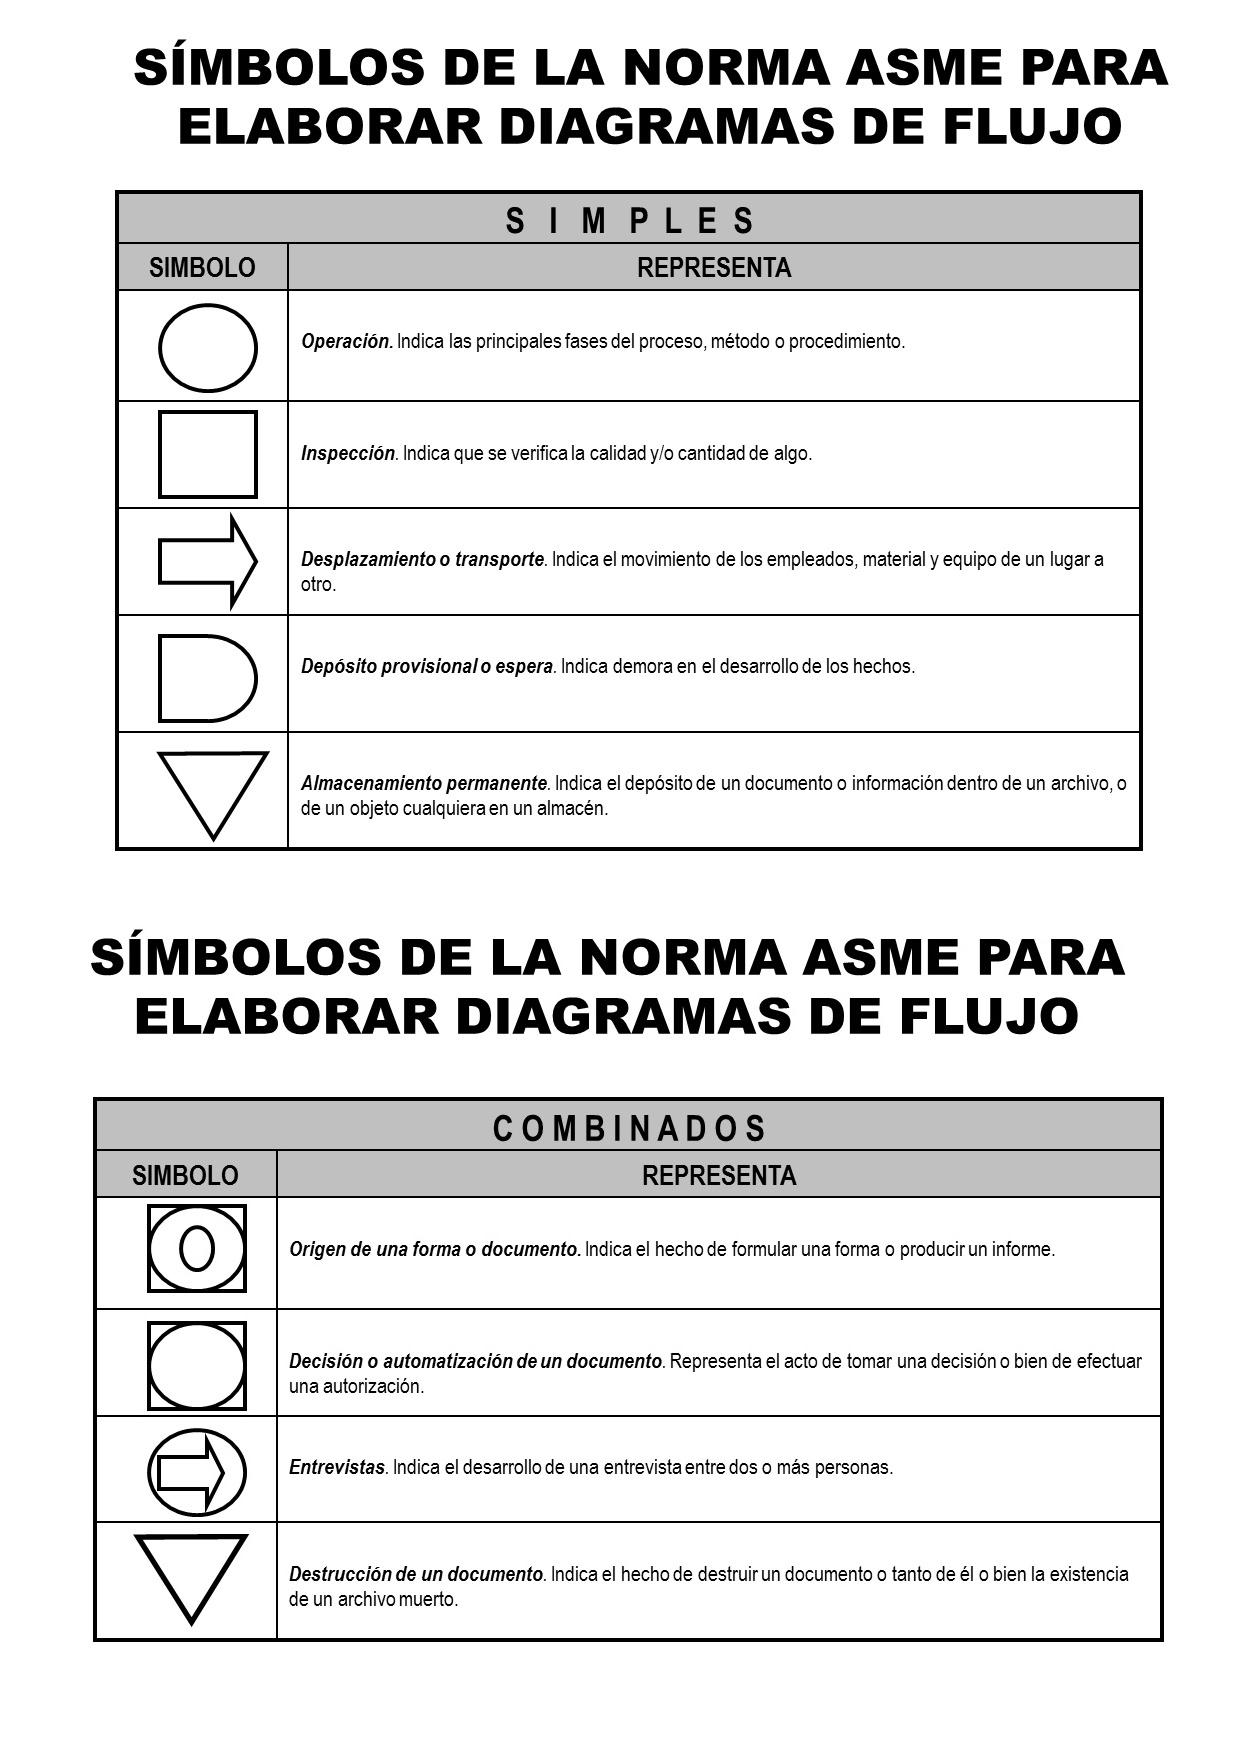 Normas asme smbolos para elaborar diagramas de flujo nuestros normas asme smbolos para elaborar diagramas de flujo nuestros servicios servicios petroleros inspecciones bogota ccuart Image collections